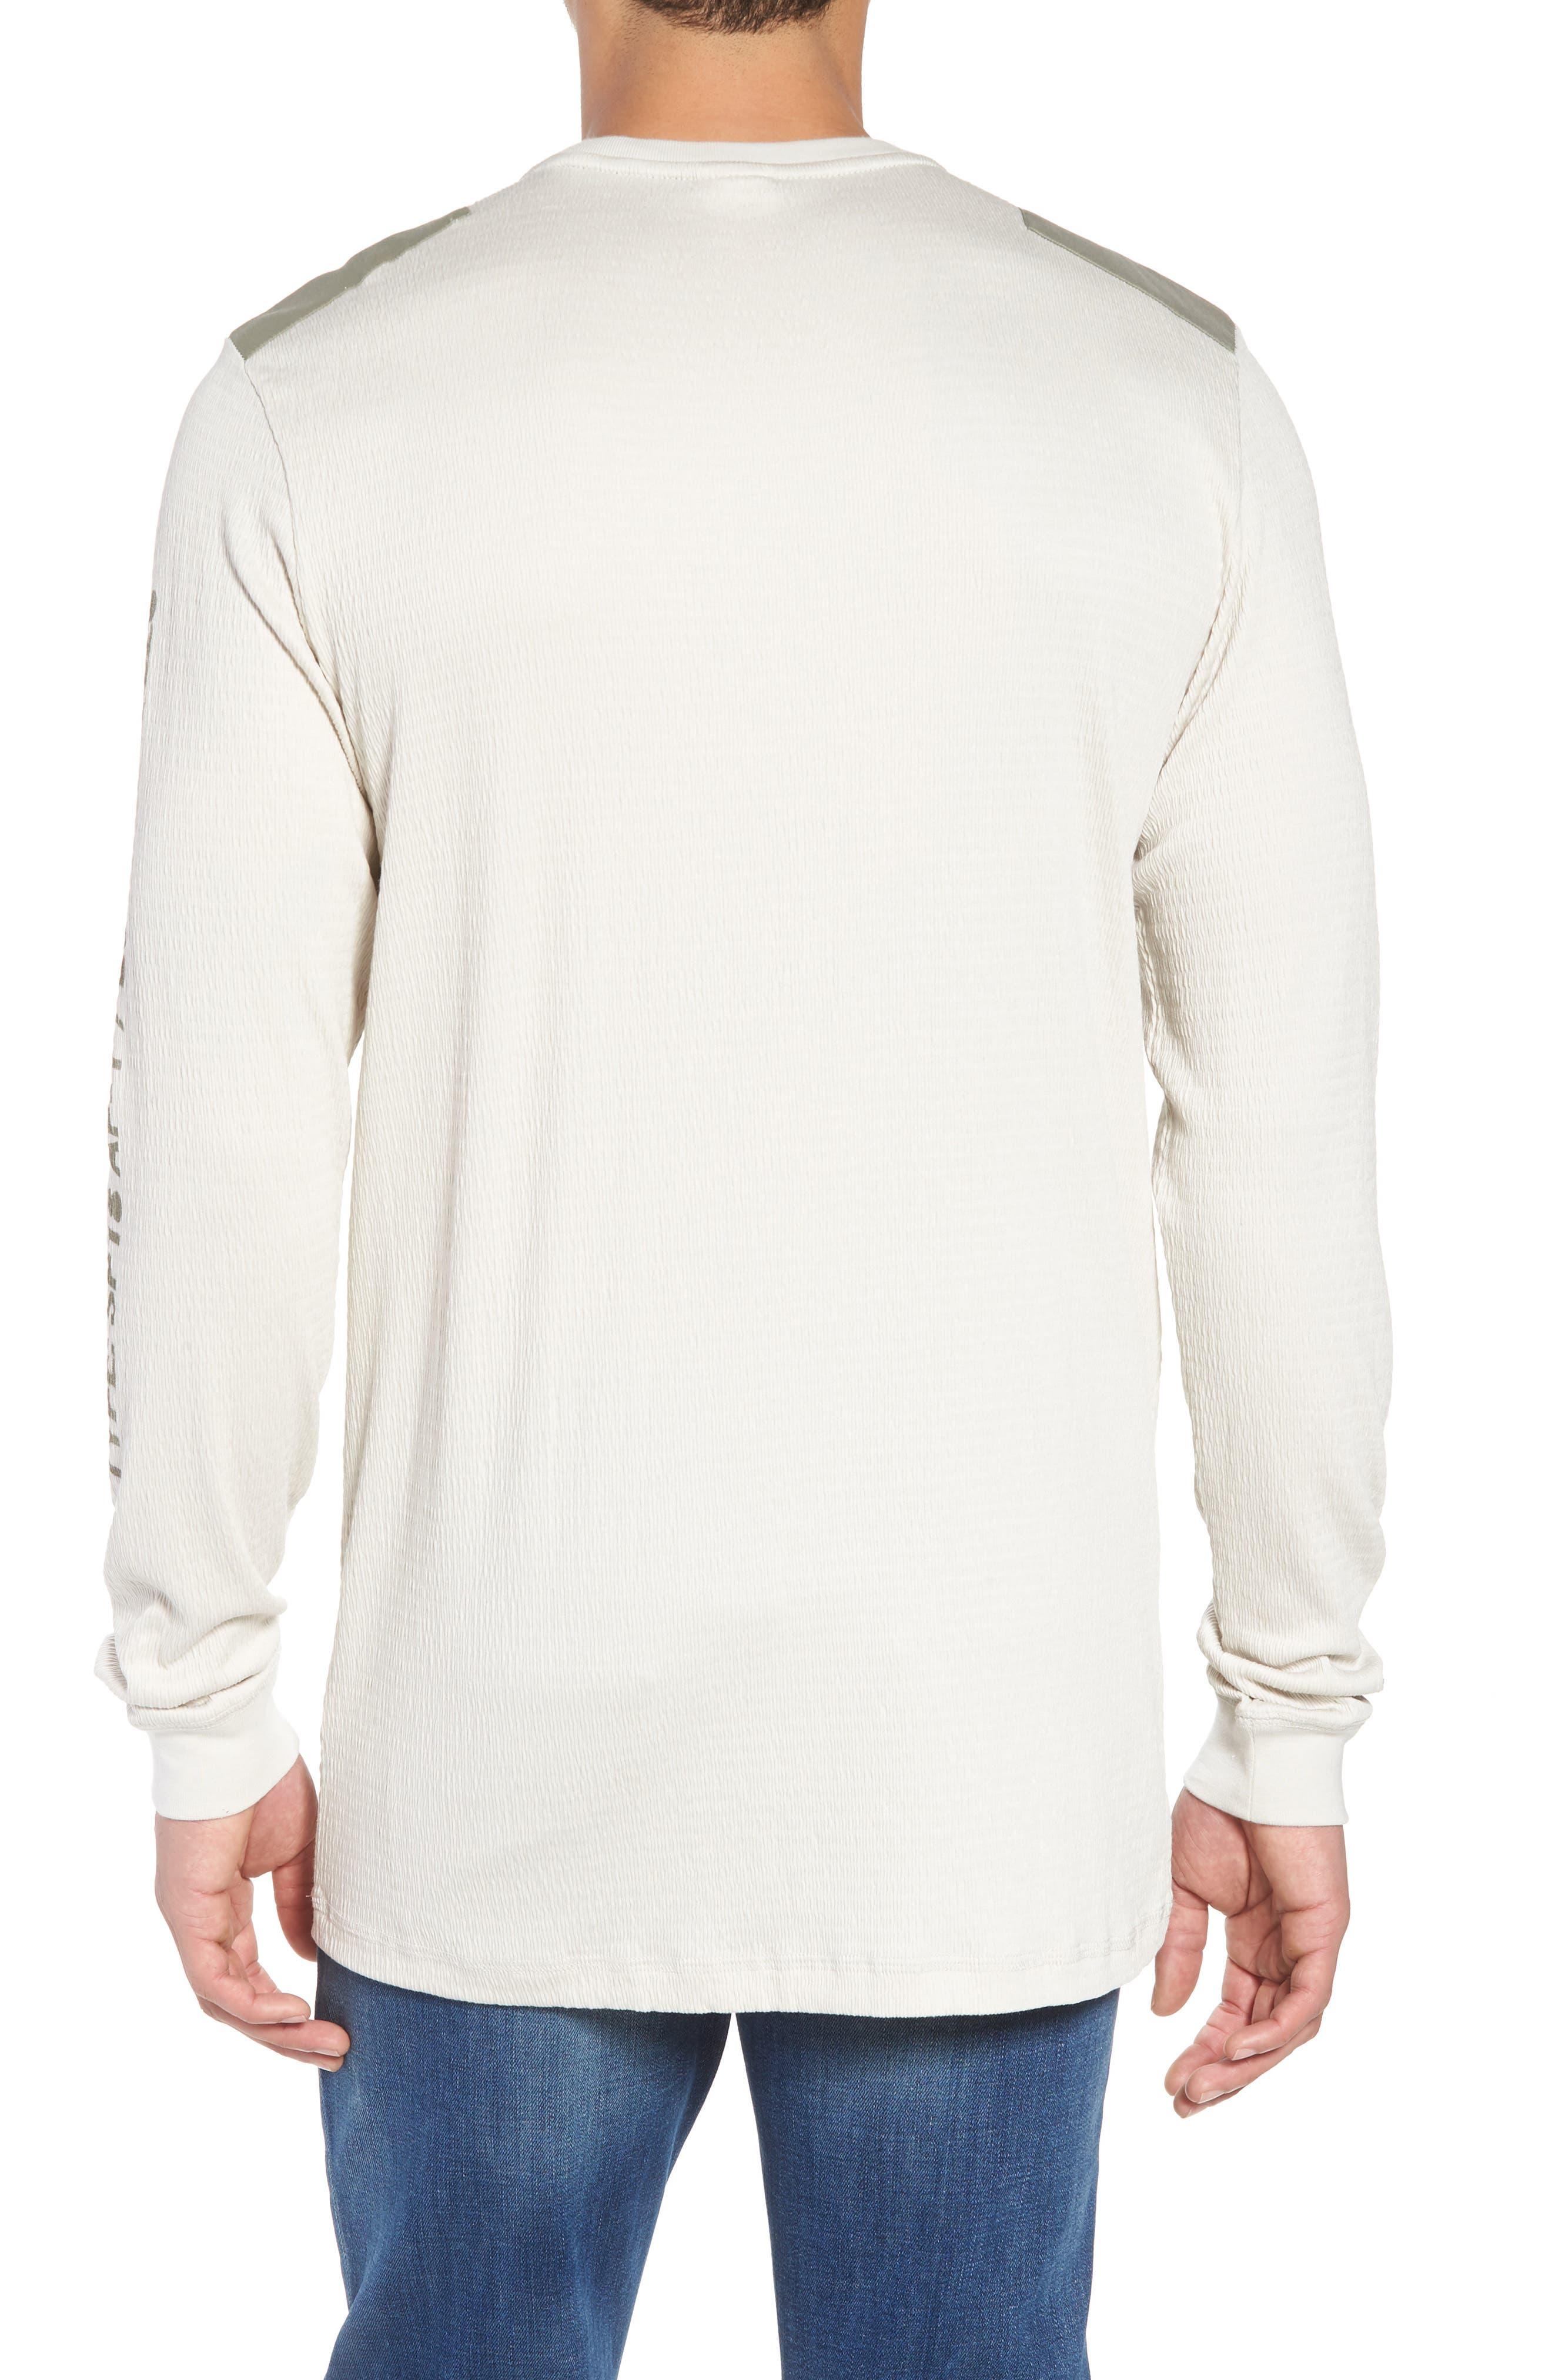 Sportswear AF-1 Long Sleeve Shirt,                             Alternate thumbnail 2, color,                             Light Bone/ Stucco/ Stucco